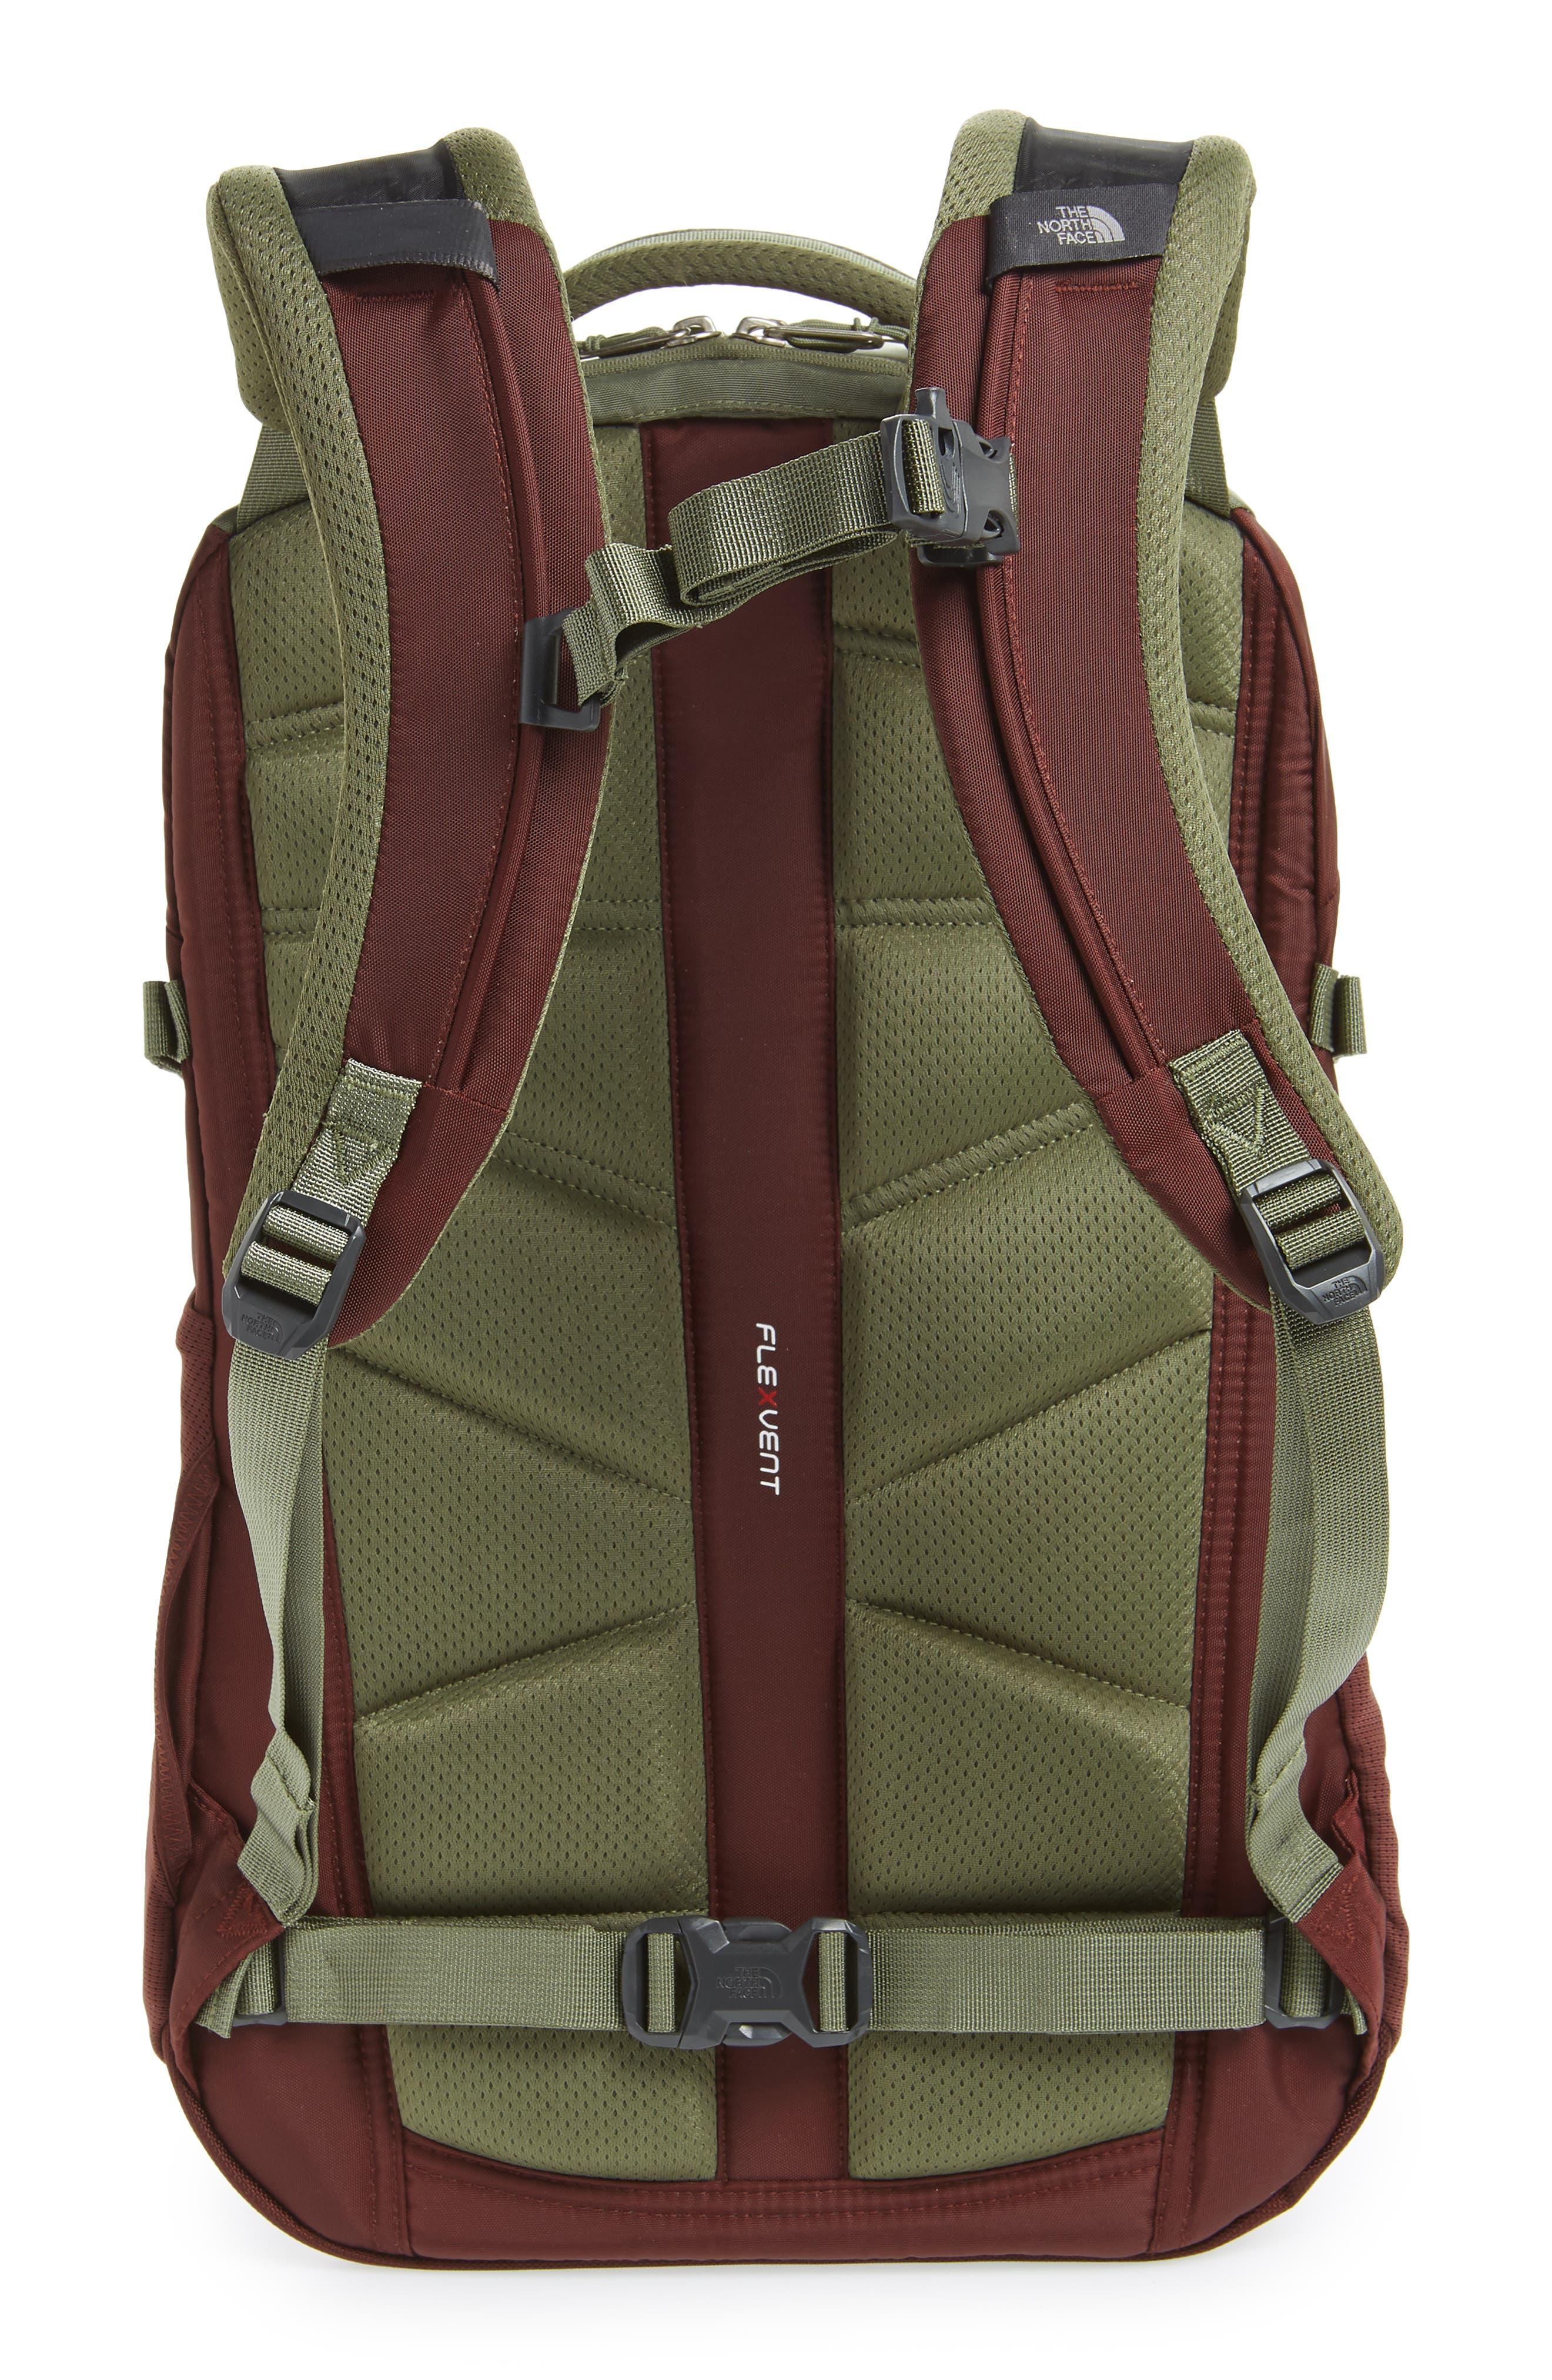 North Face Backpack Monogrammed- Fenix Toulouse Handball 8a7654663eaf